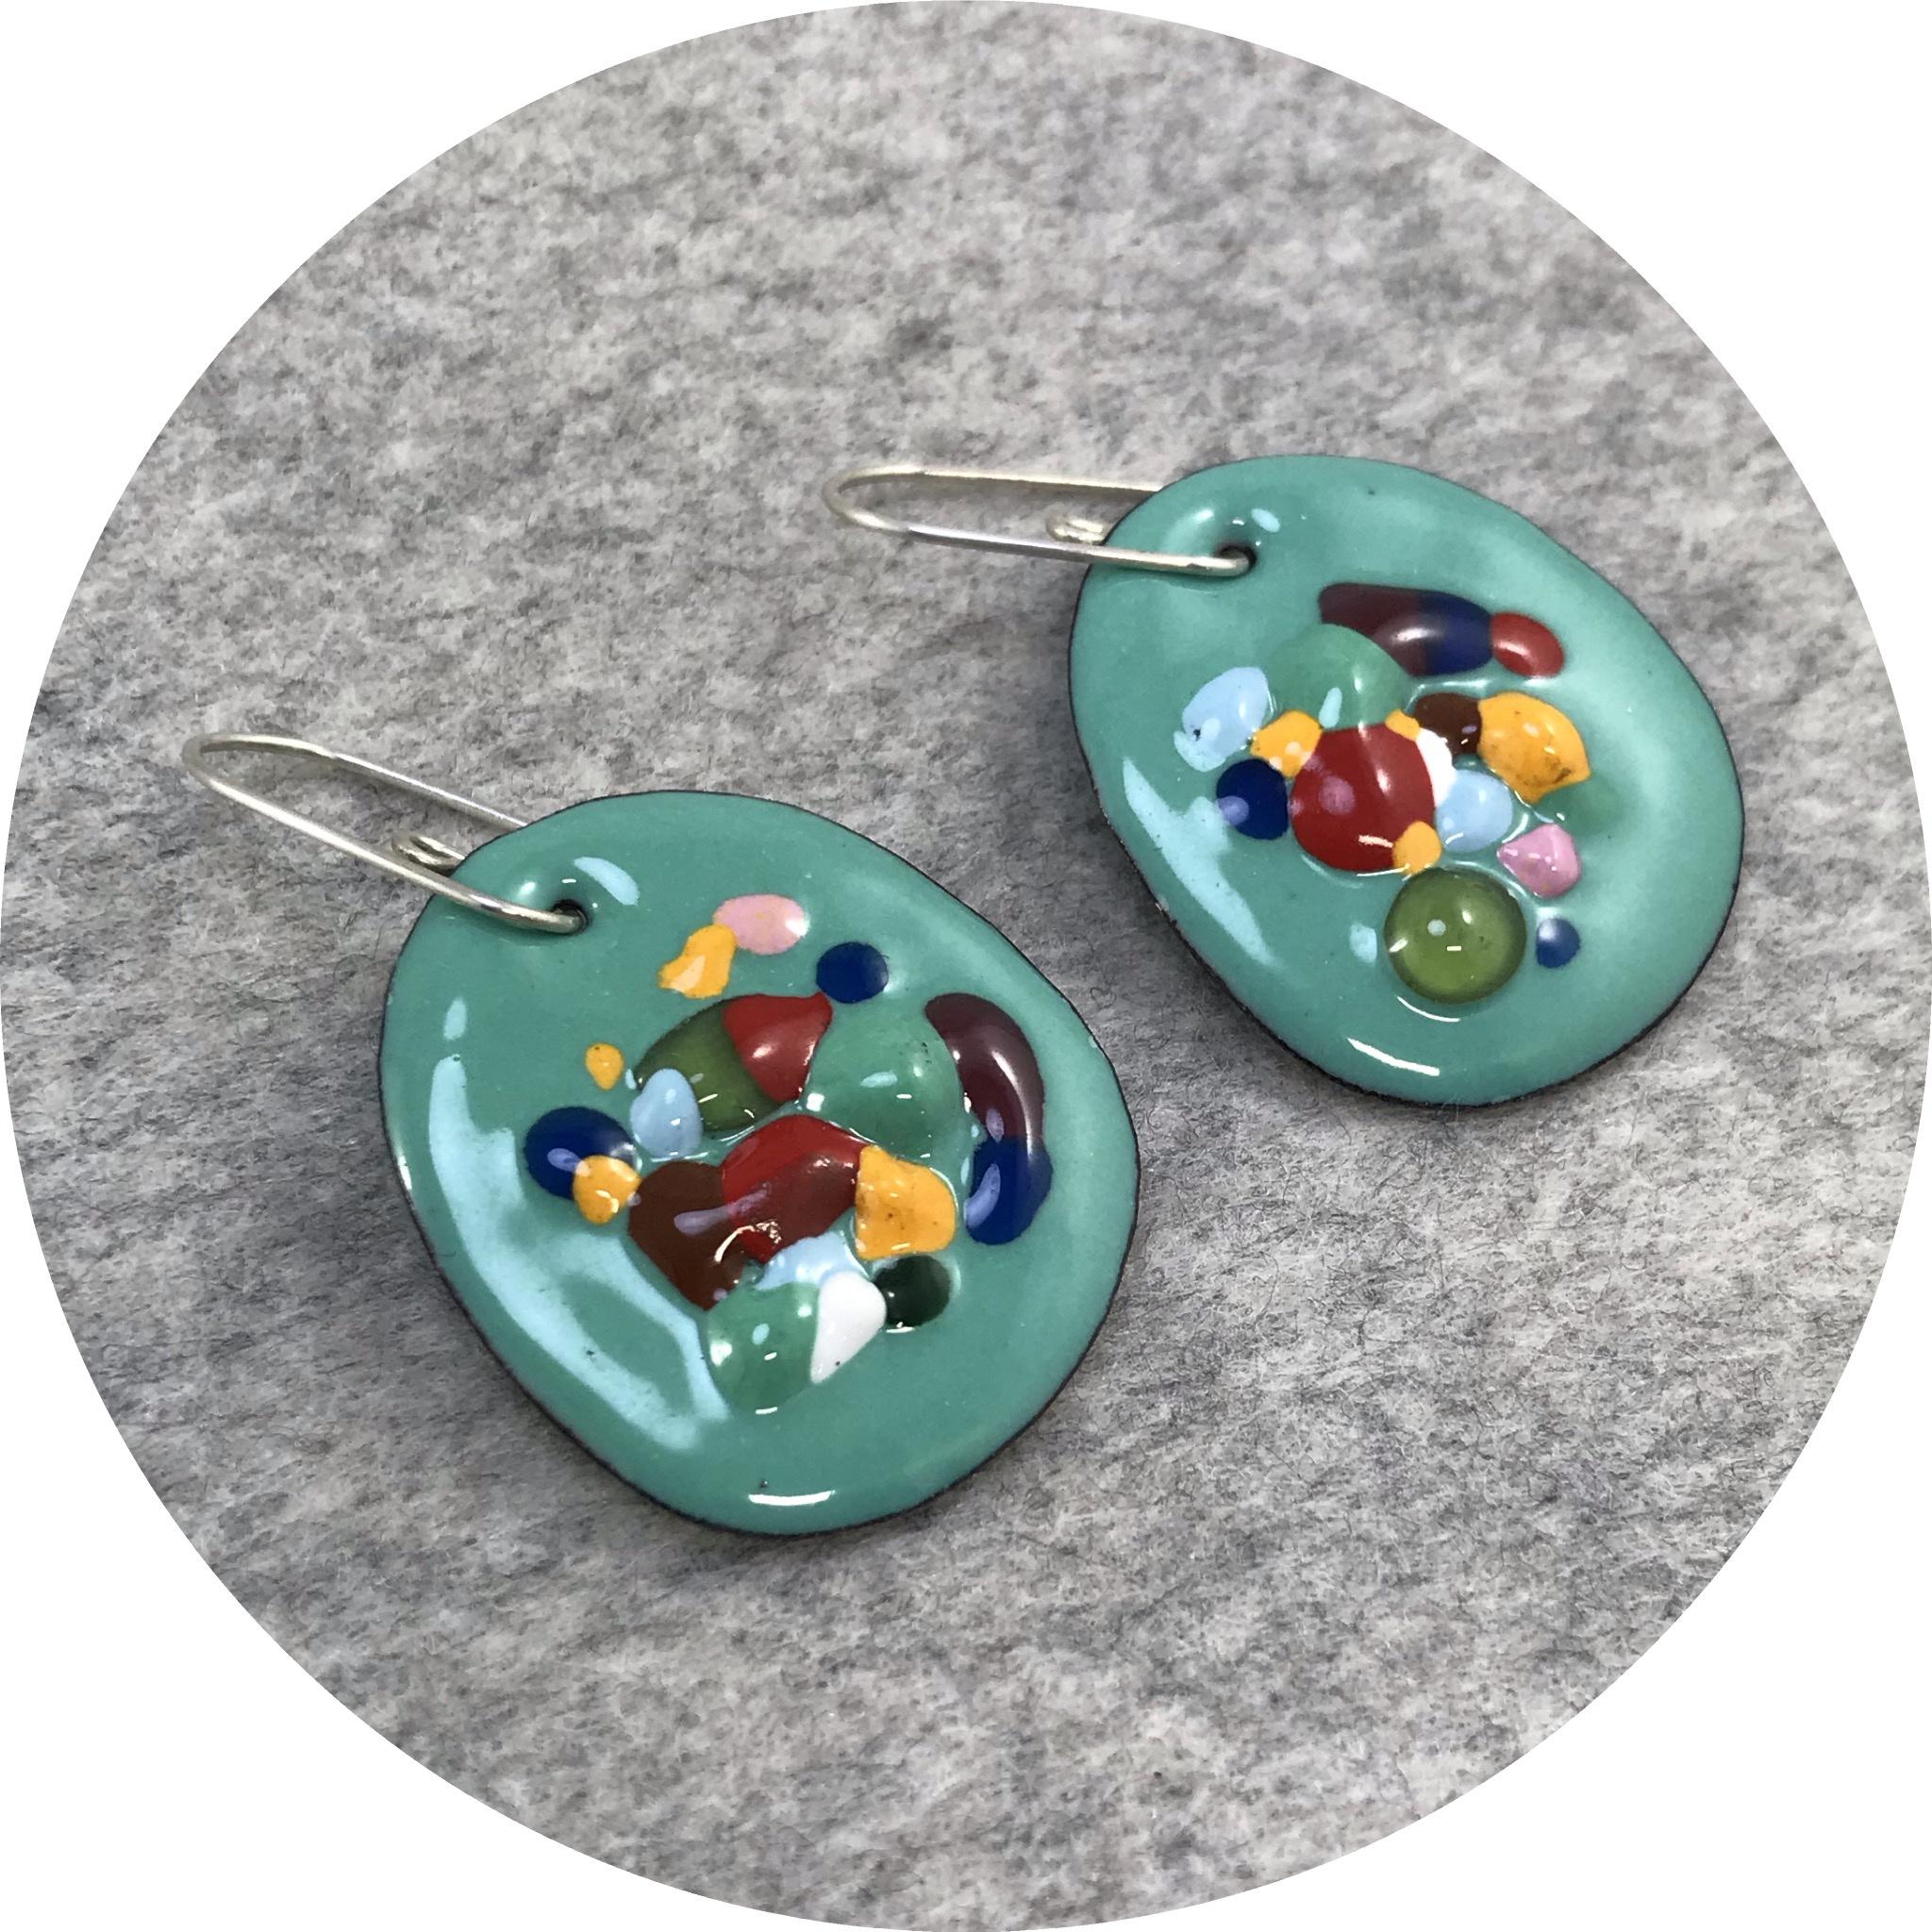 Jenna O'Brien - Small Queenie Earrings in Mint Green with Colourful Flecks